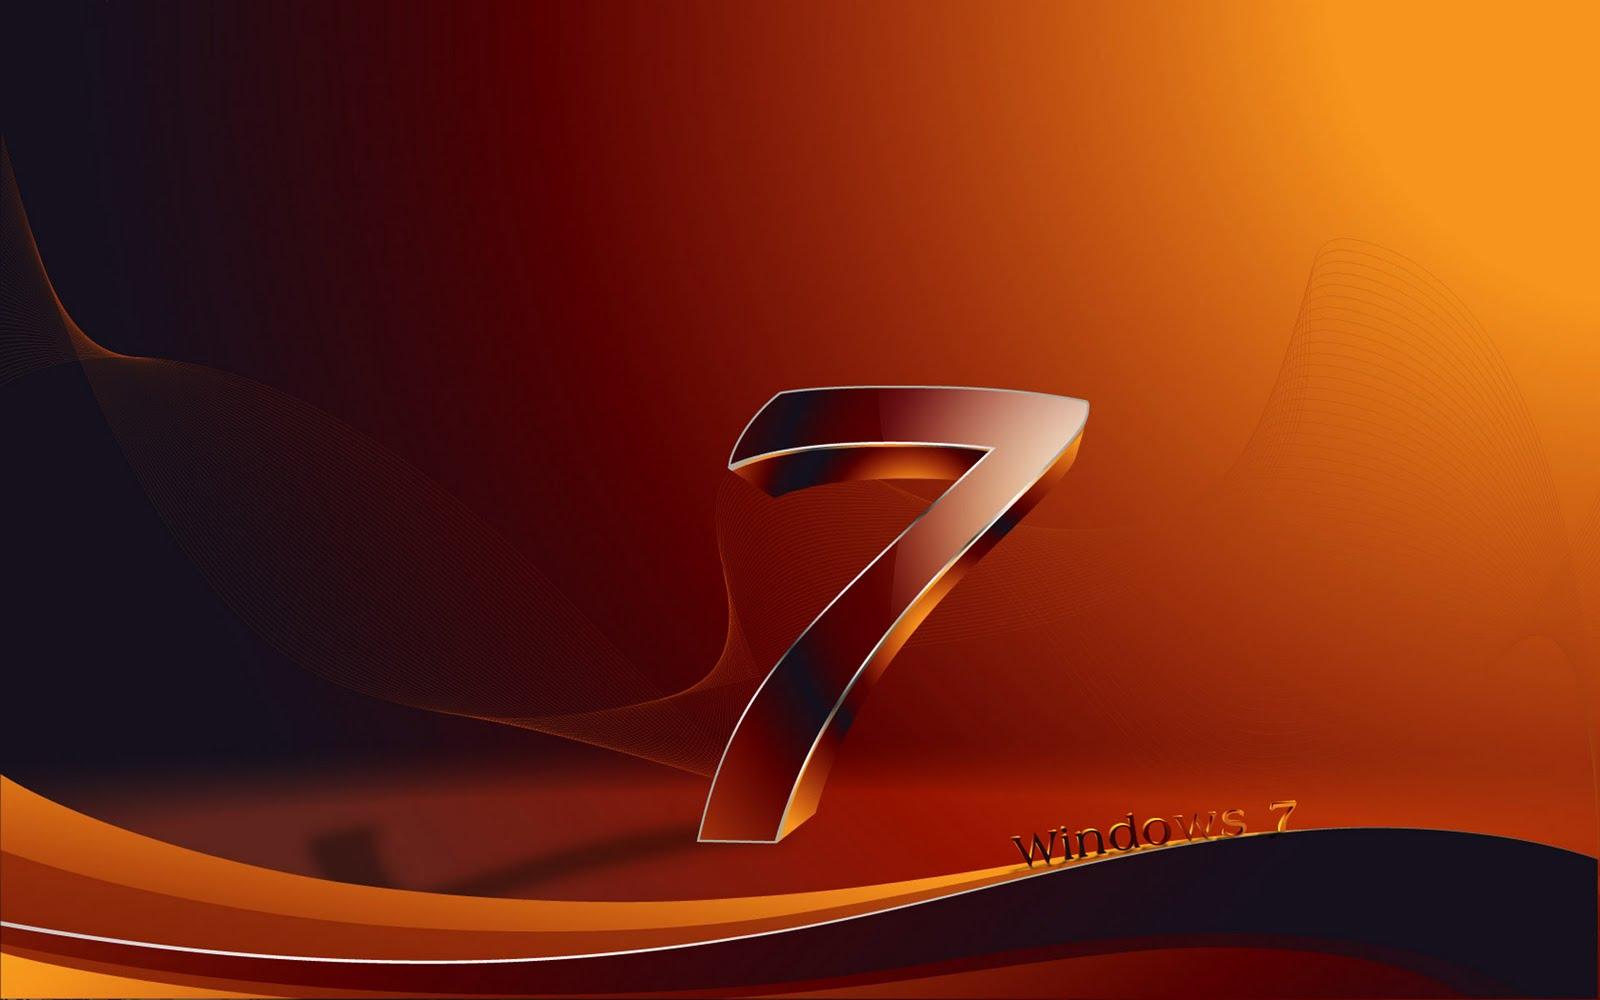 http://3.bp.blogspot.com/-aP-ARxhcRuA/Th2BKKPzMxI/AAAAAAAAMDI/aL6bEweyb28/s1600/Windows-7-Widescreen.jpg